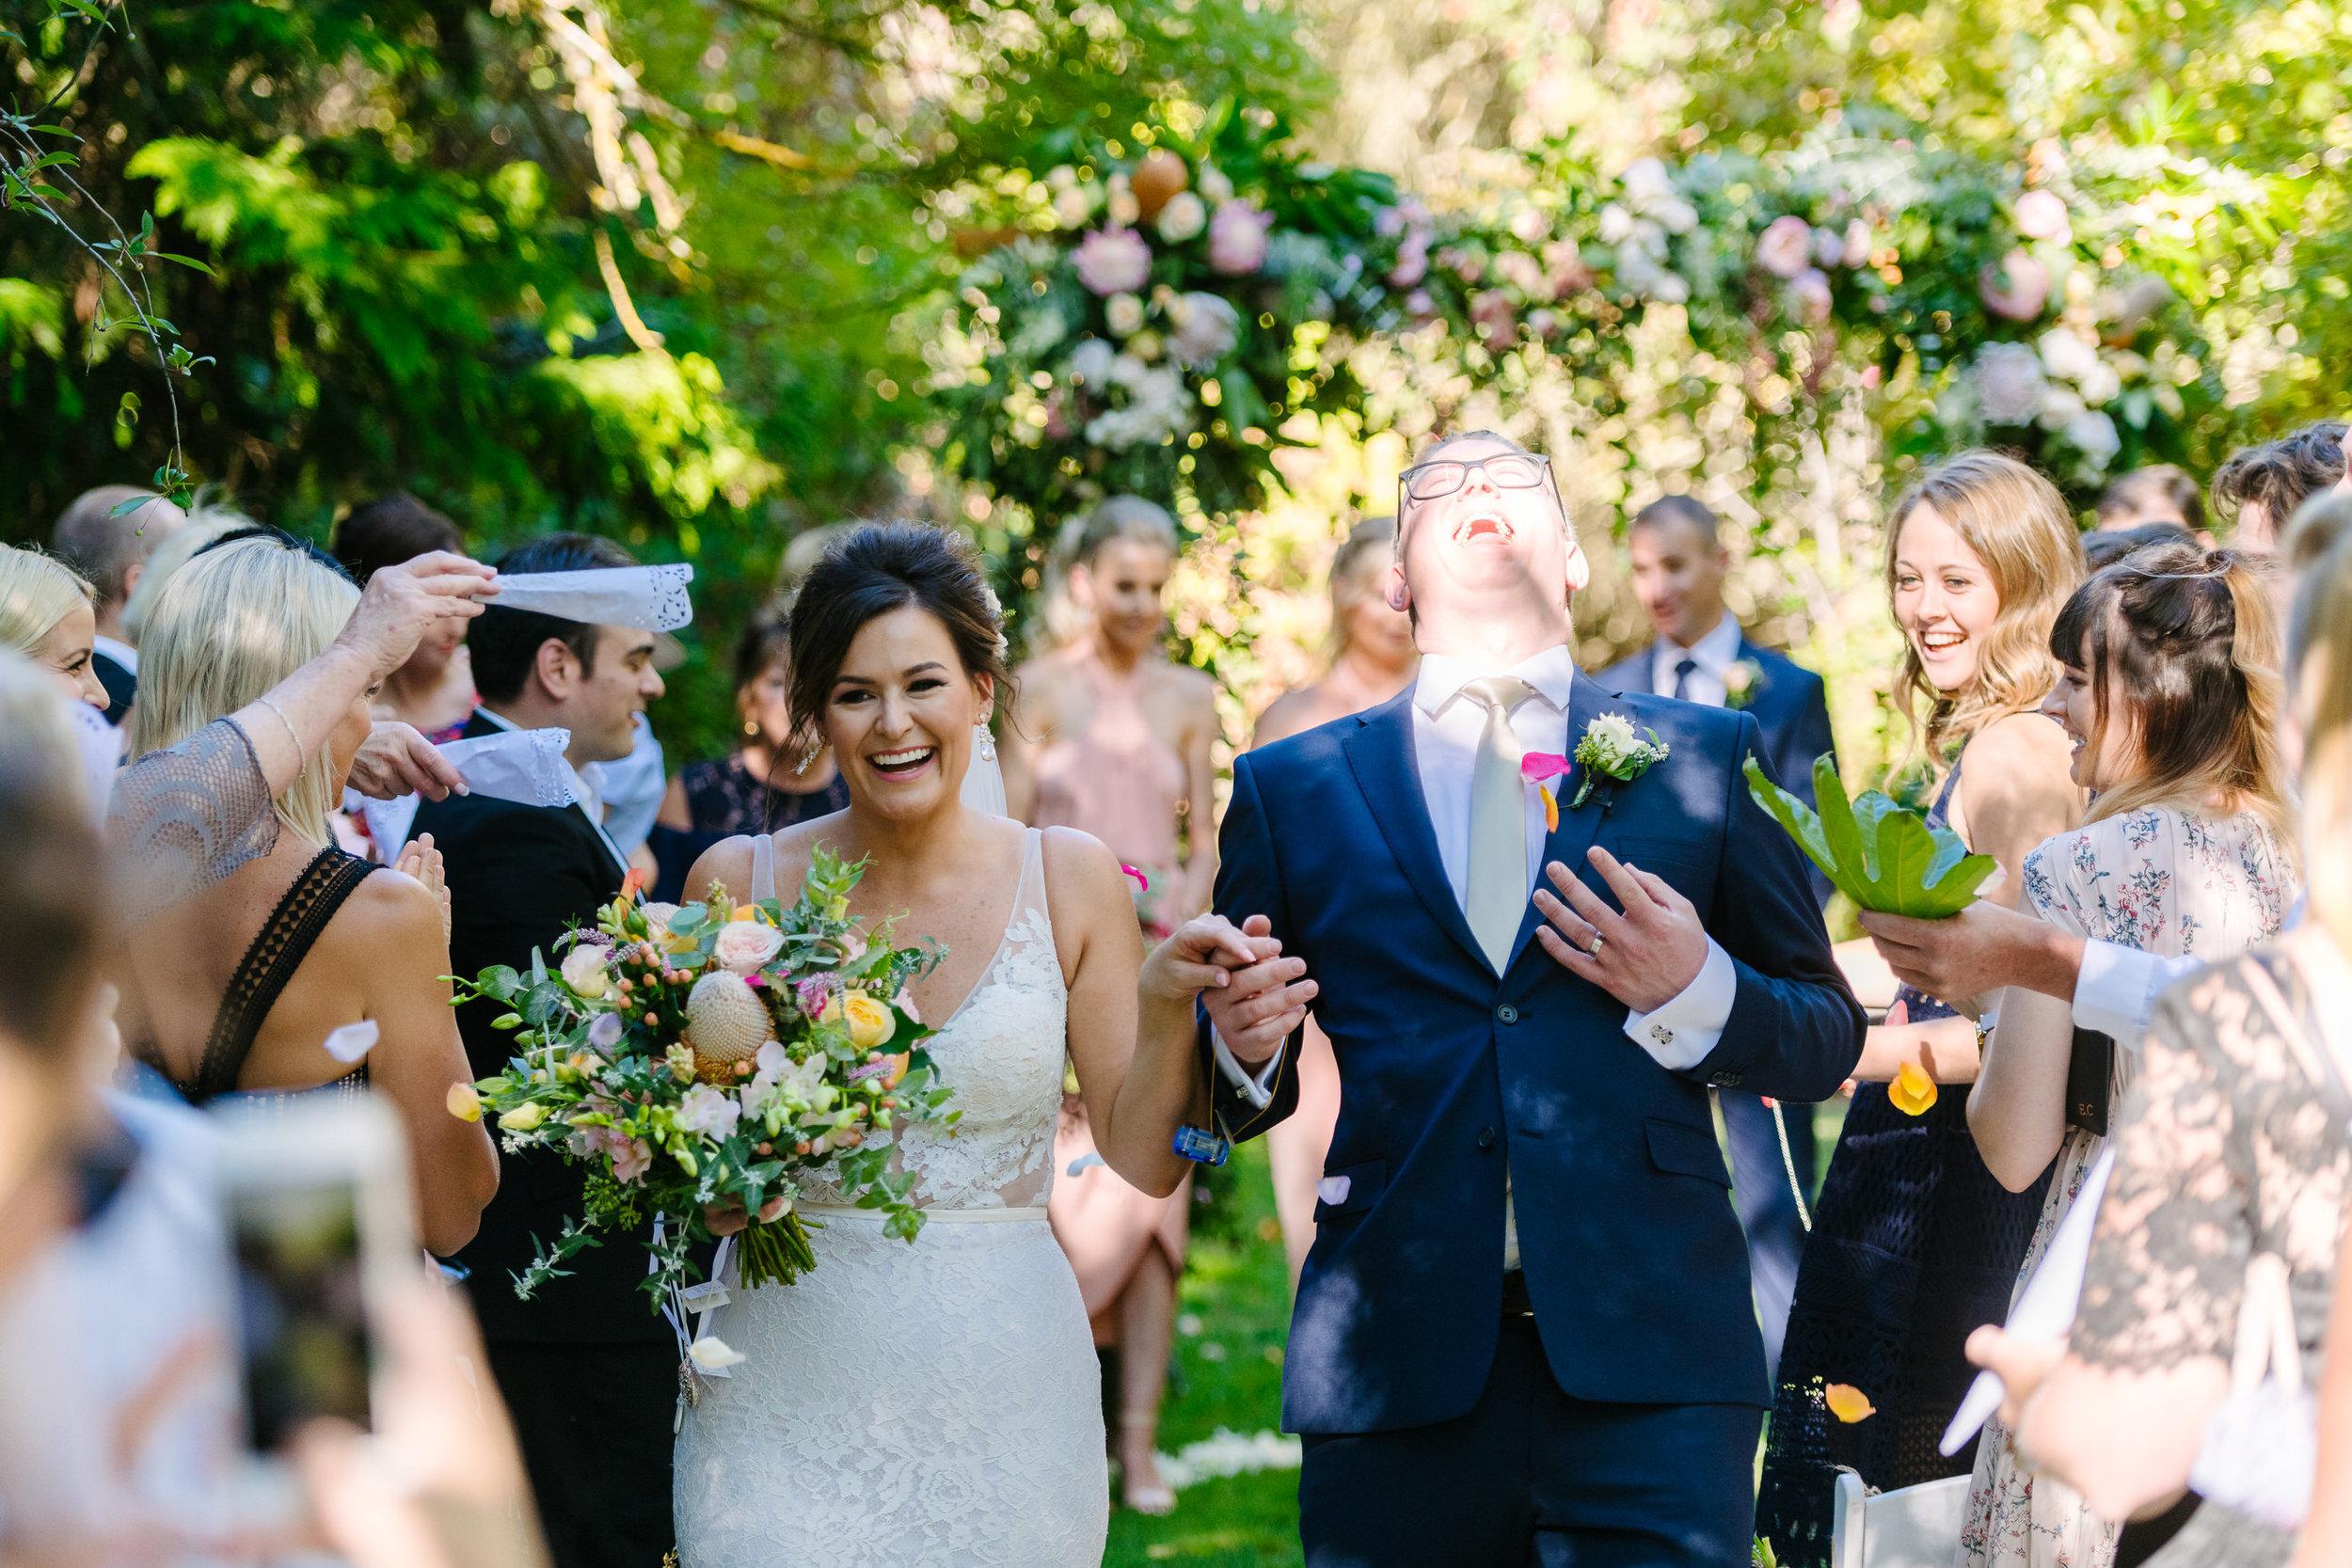 Justin_And_Jim_Photography_Chateau_Dore_Bendigo_Wedding46.JPG